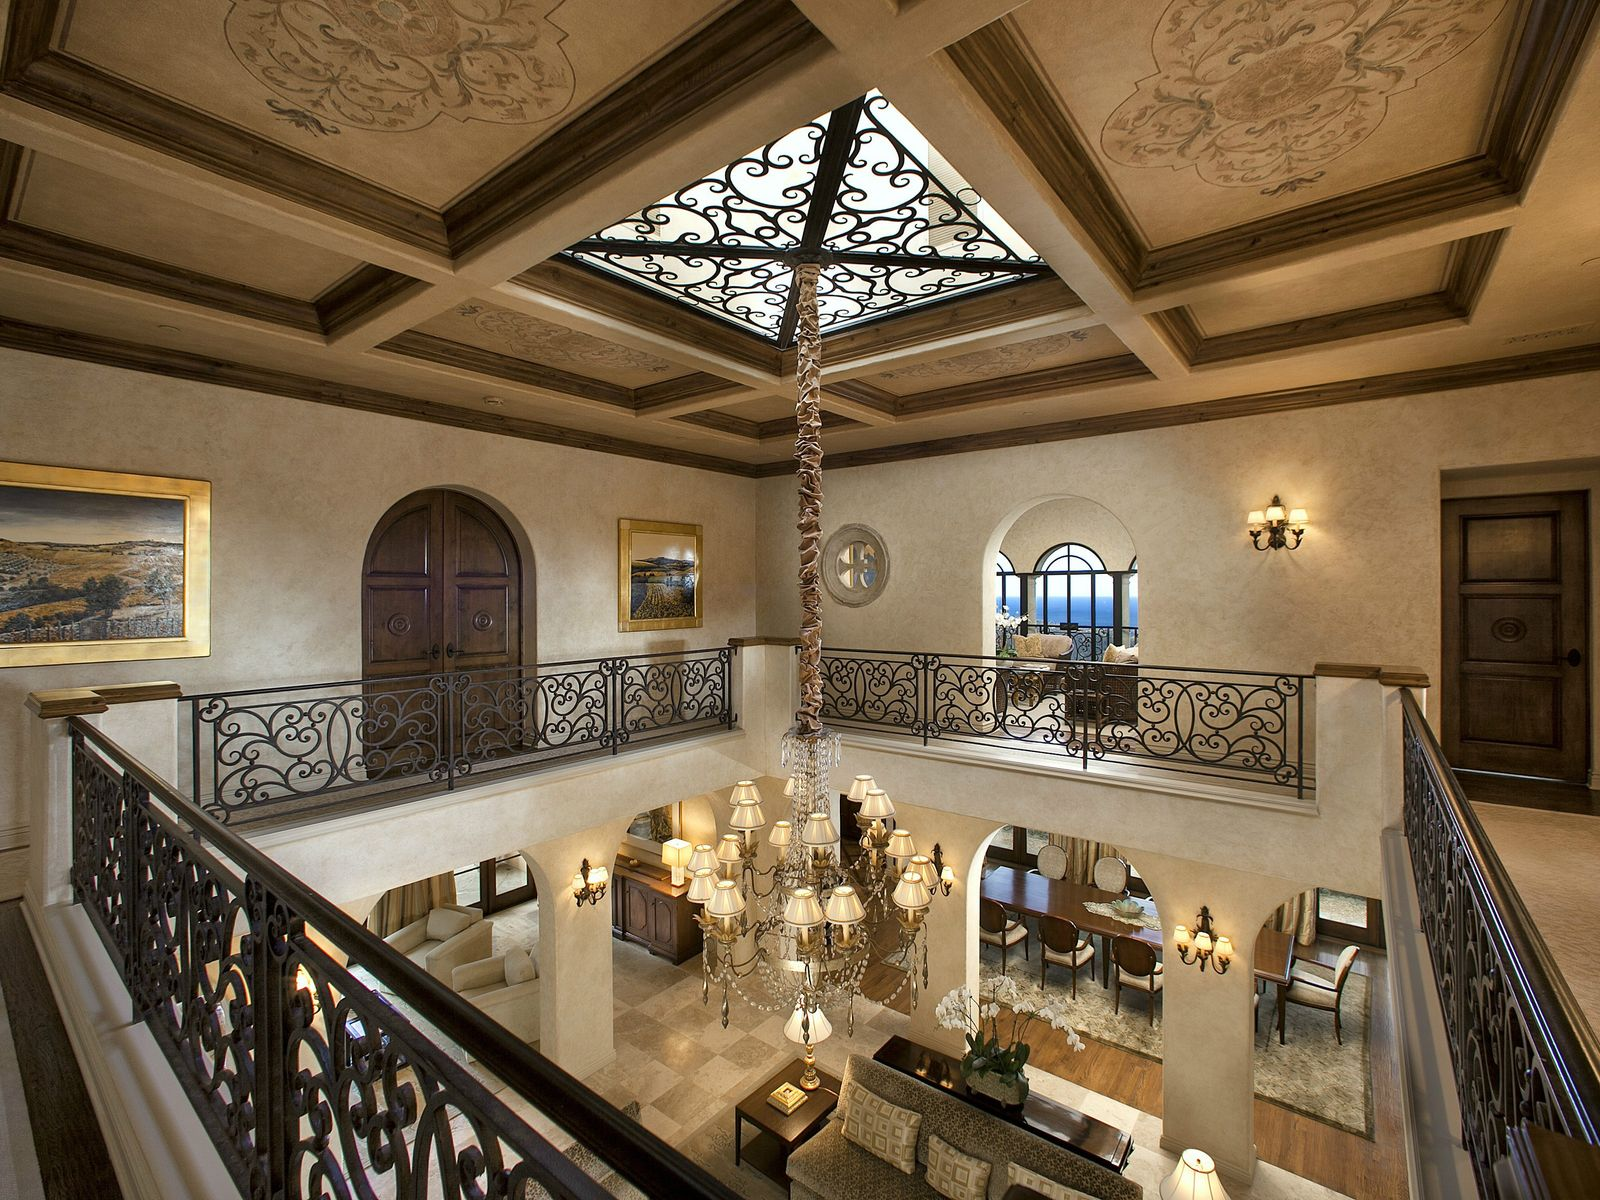 2nd story mezzanine and atrium